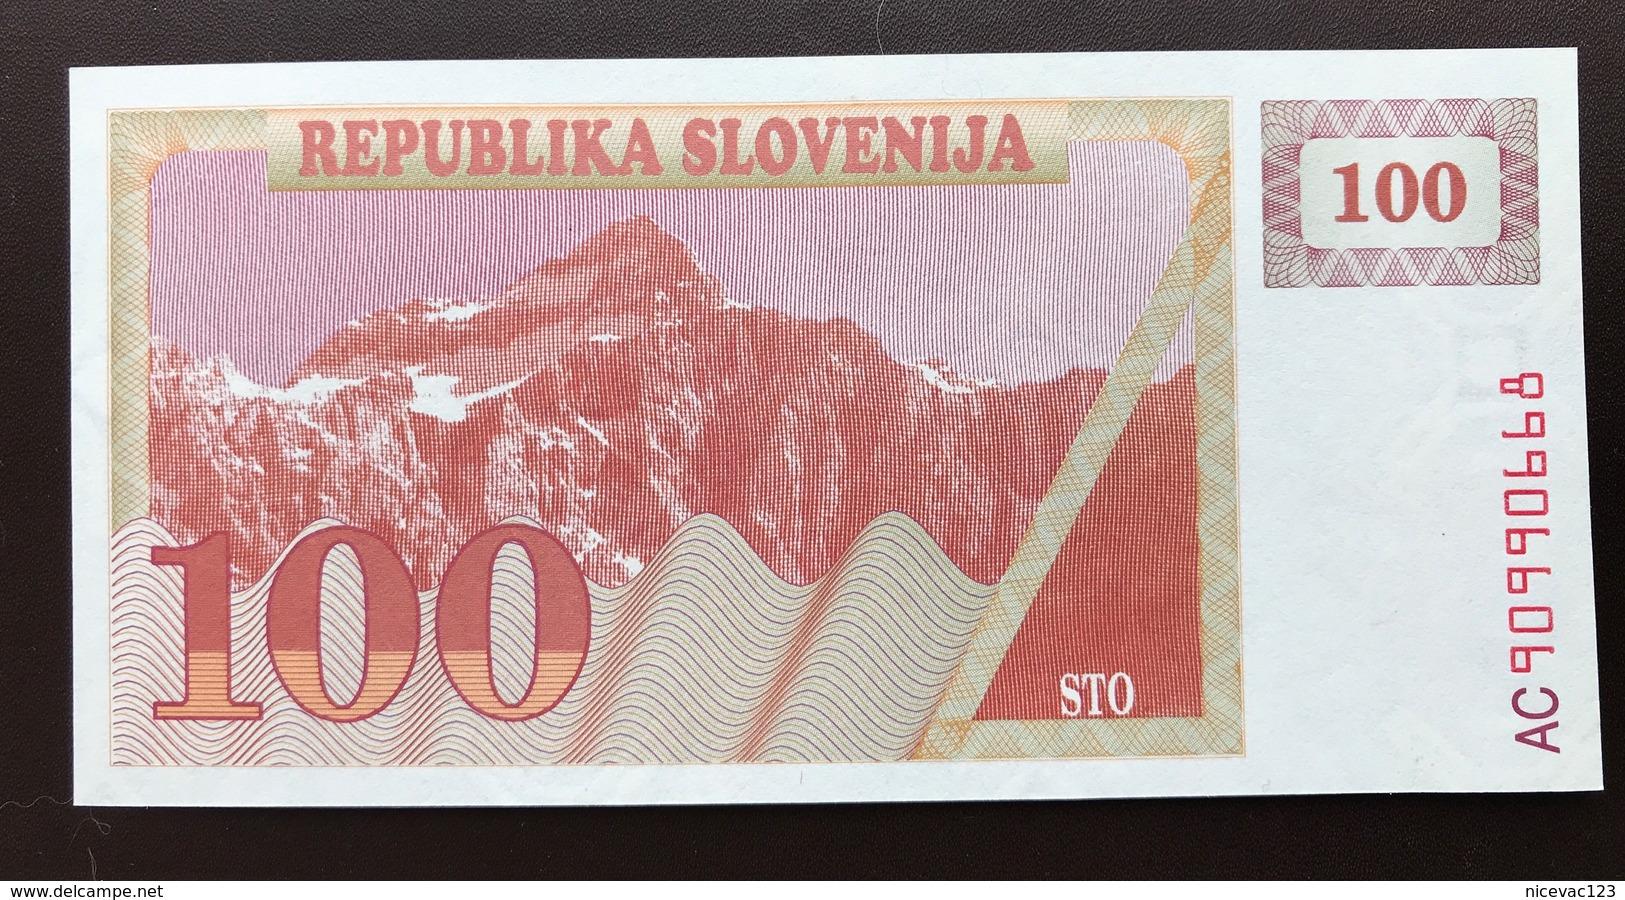 SLOVENIA P6 100 TOLAR 1990 UNC - Slovénie